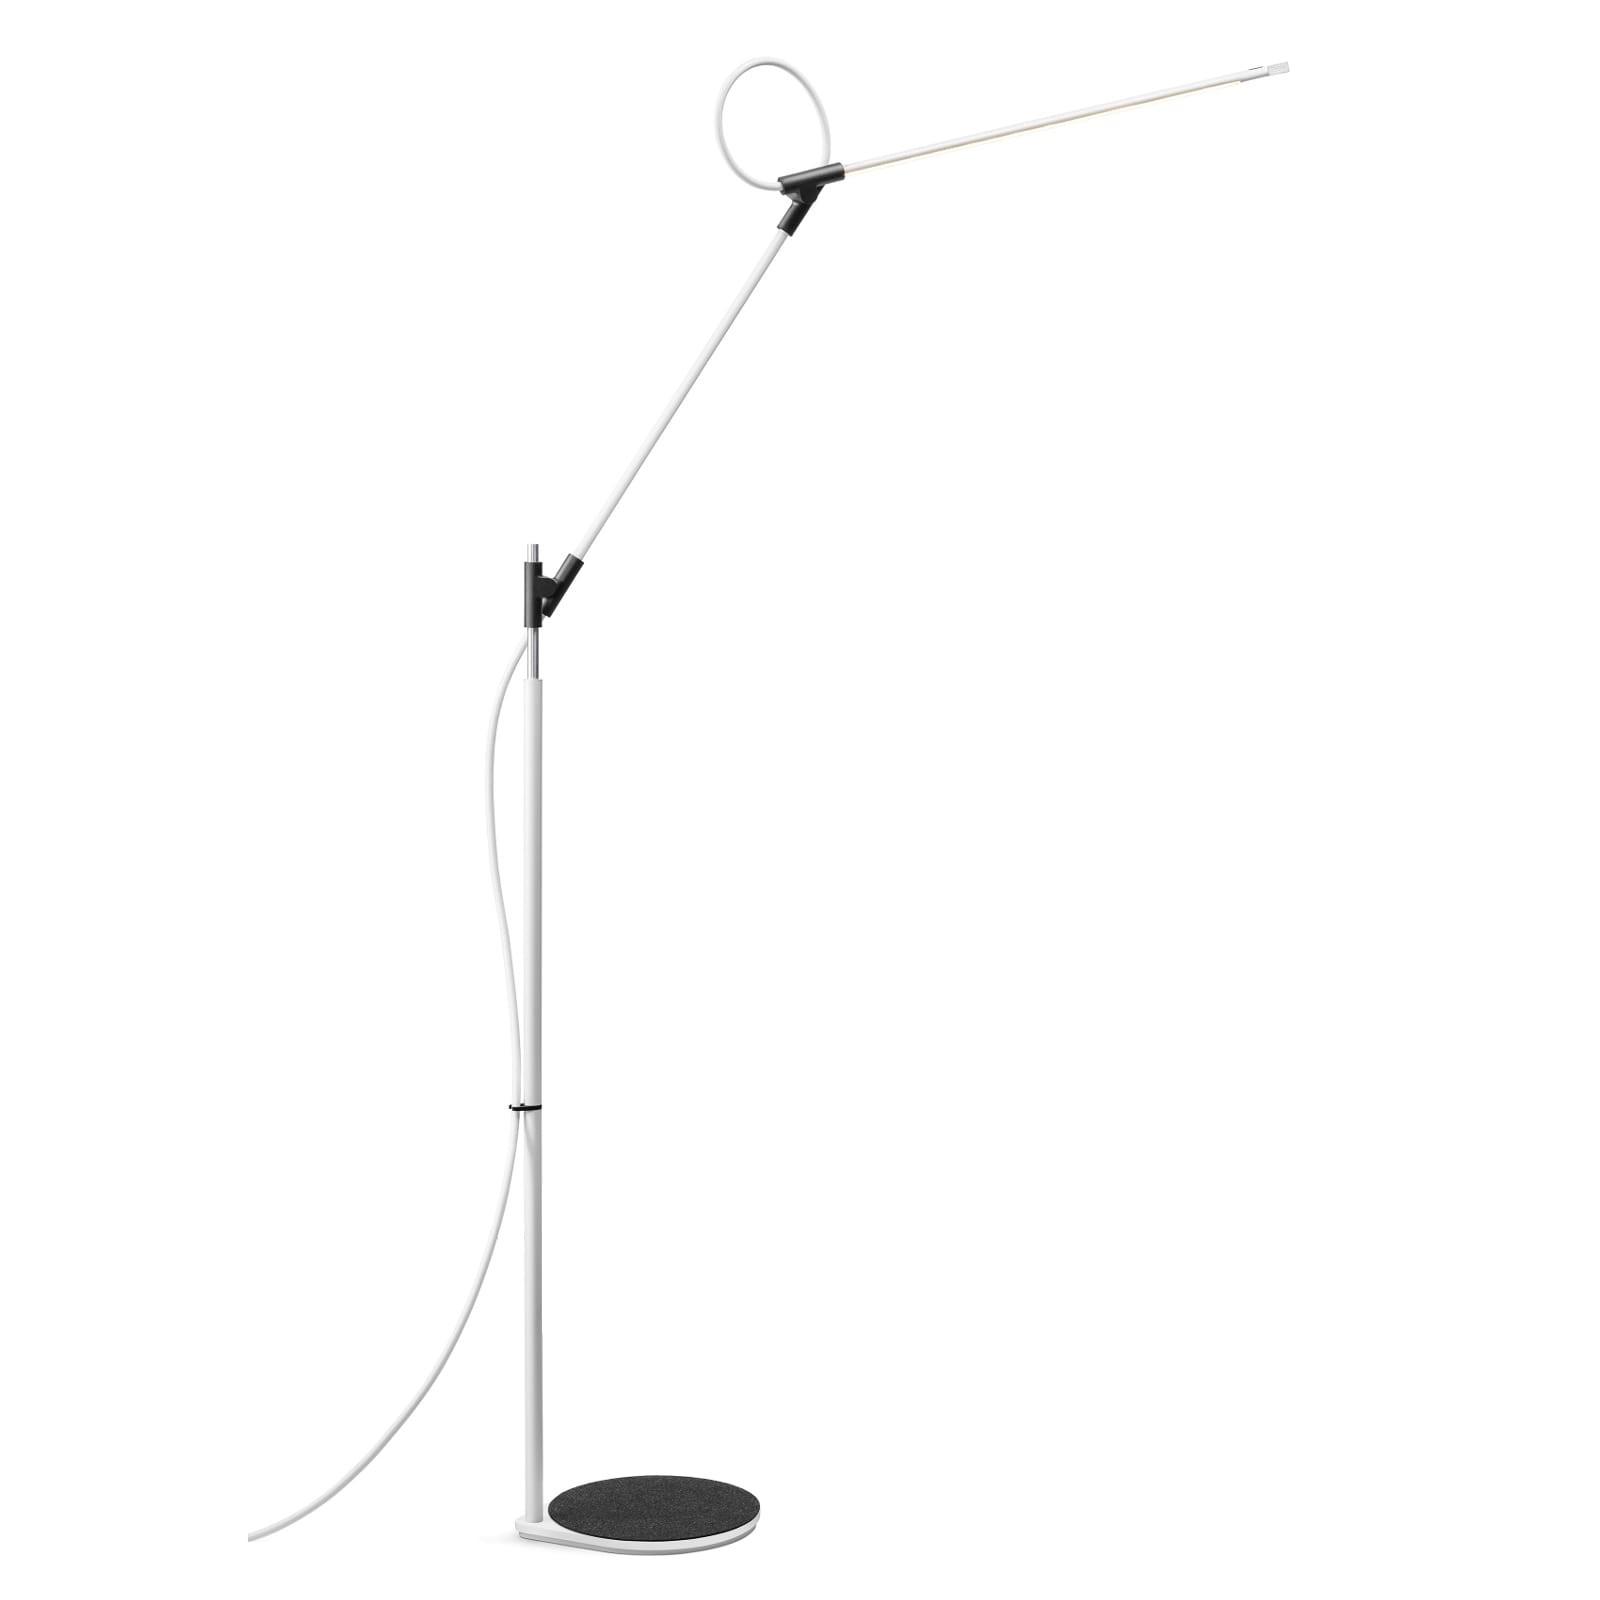 Superlight Φωτιστικό Δαπέδου LED (Λευκό) - Pablo Designs